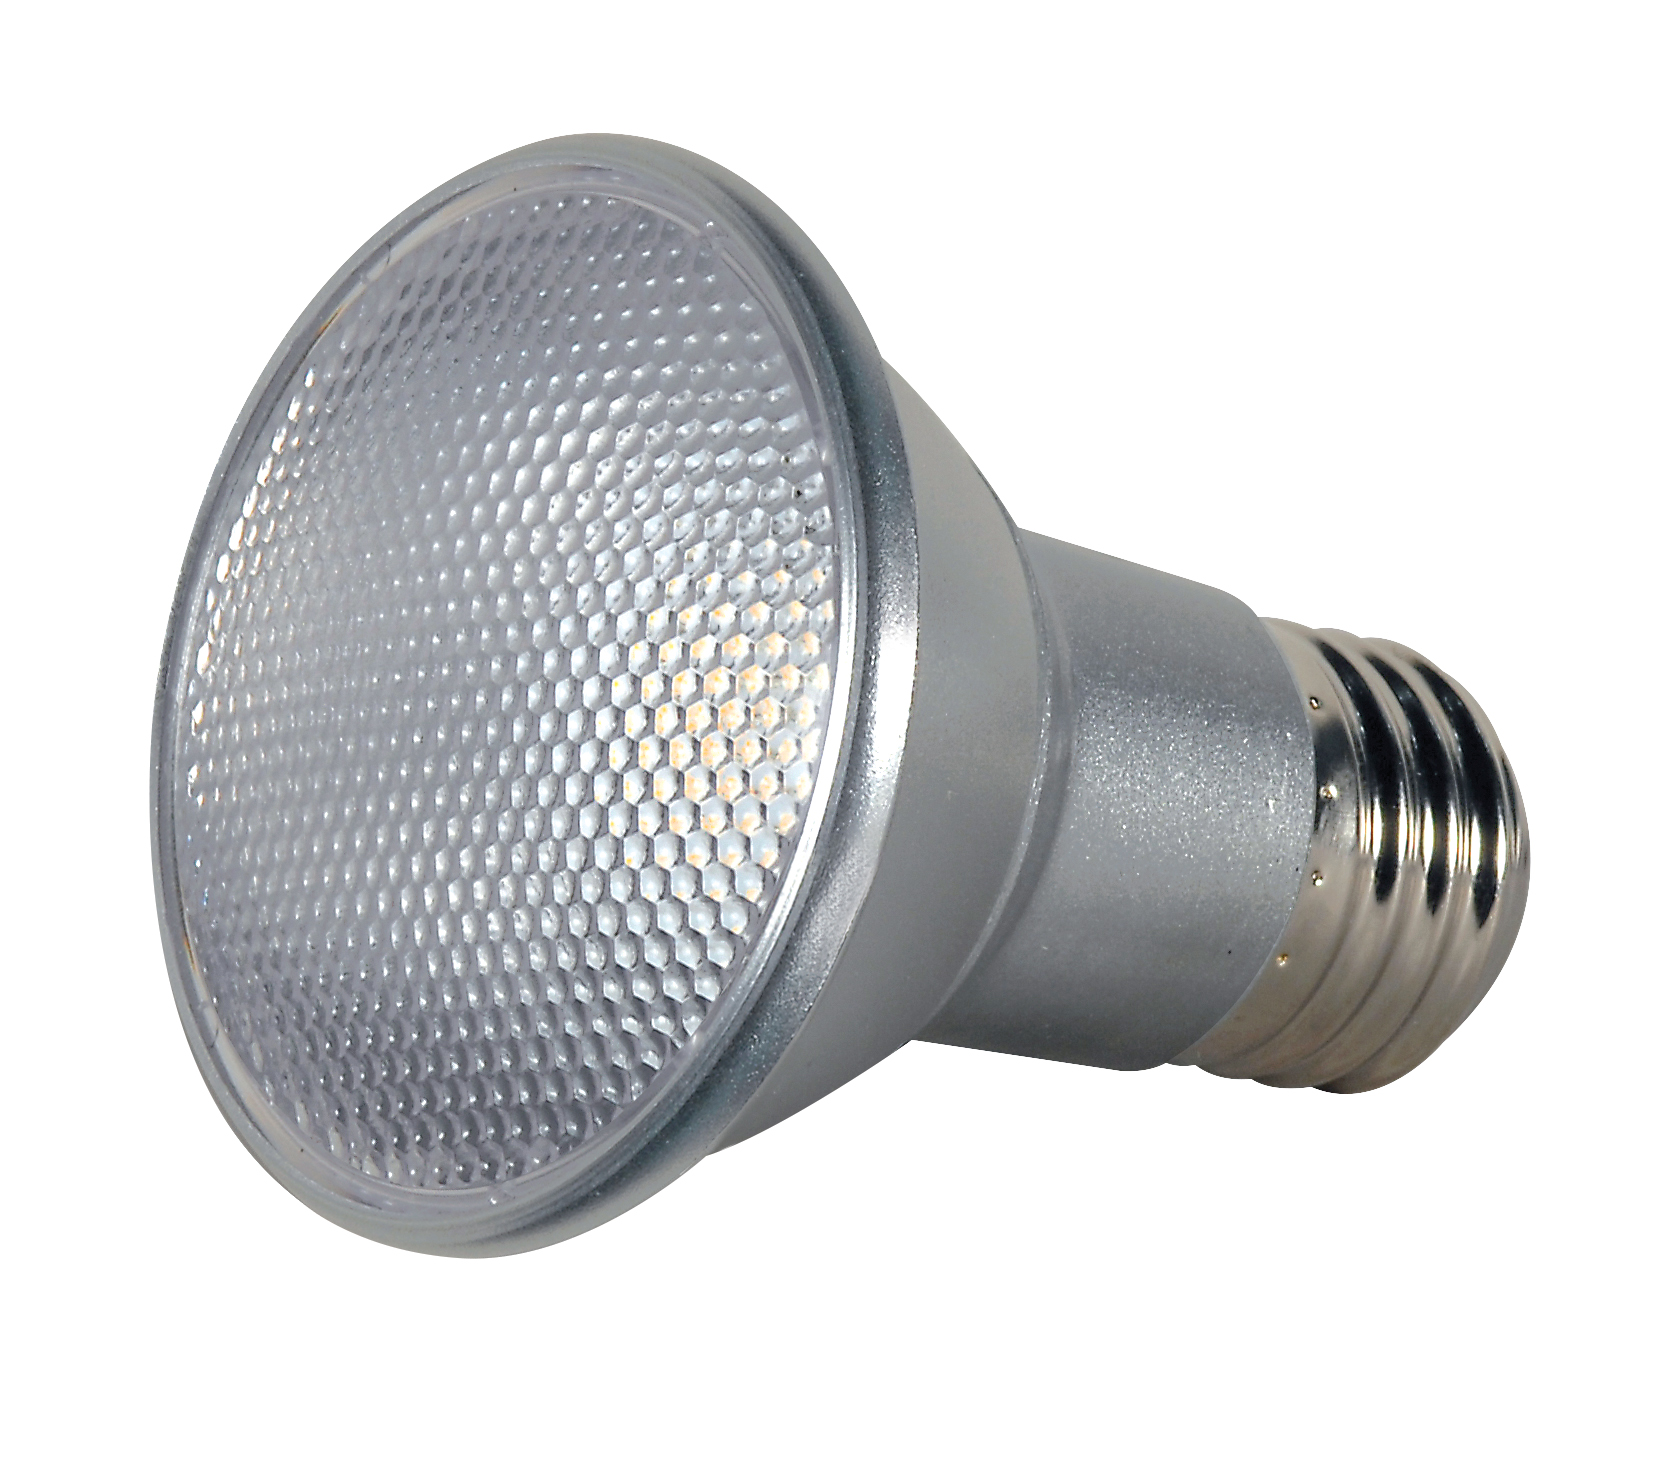 Satco,S9401,SATCO® S9401 Dimmable Reflective Lamp, 7 W, LED Lamp, Medium E26 Lamp Base, PAR20 Shape, 525 Lumens Initial